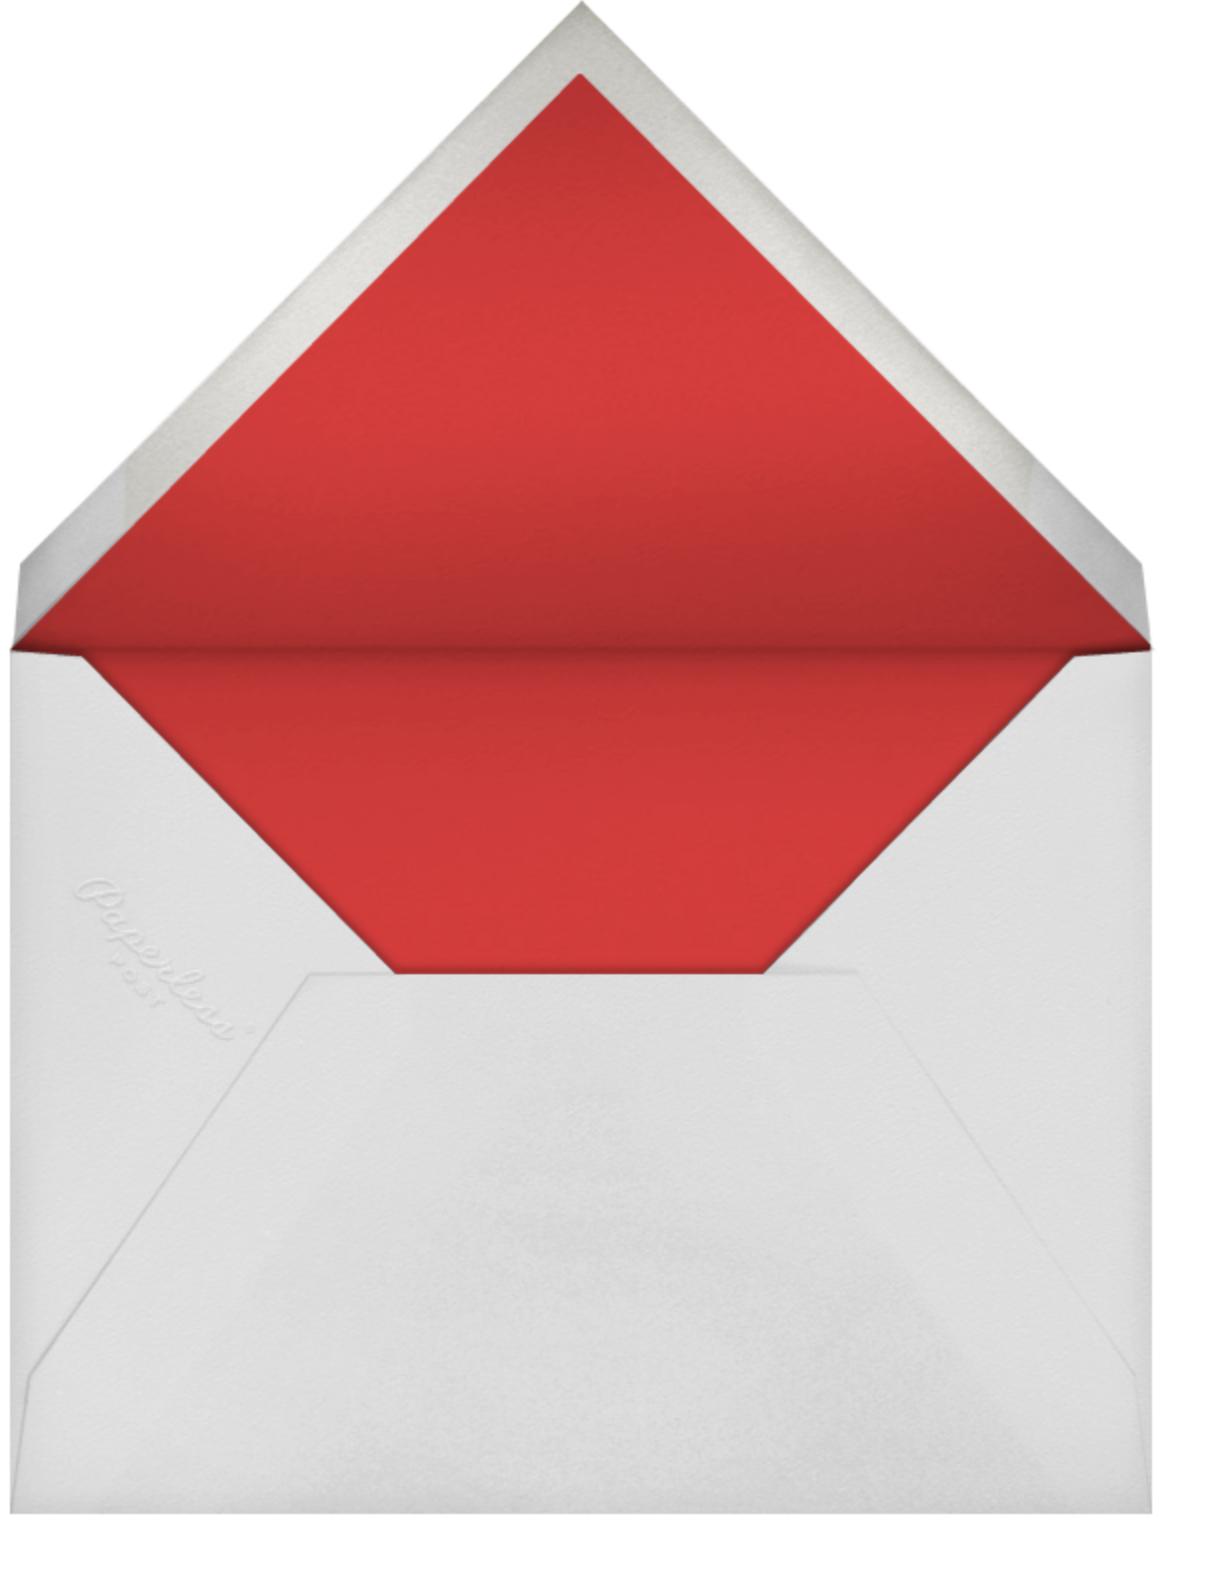 Gardenia - Red/Gold - Oscar de la Renta - Christmas party - envelope back